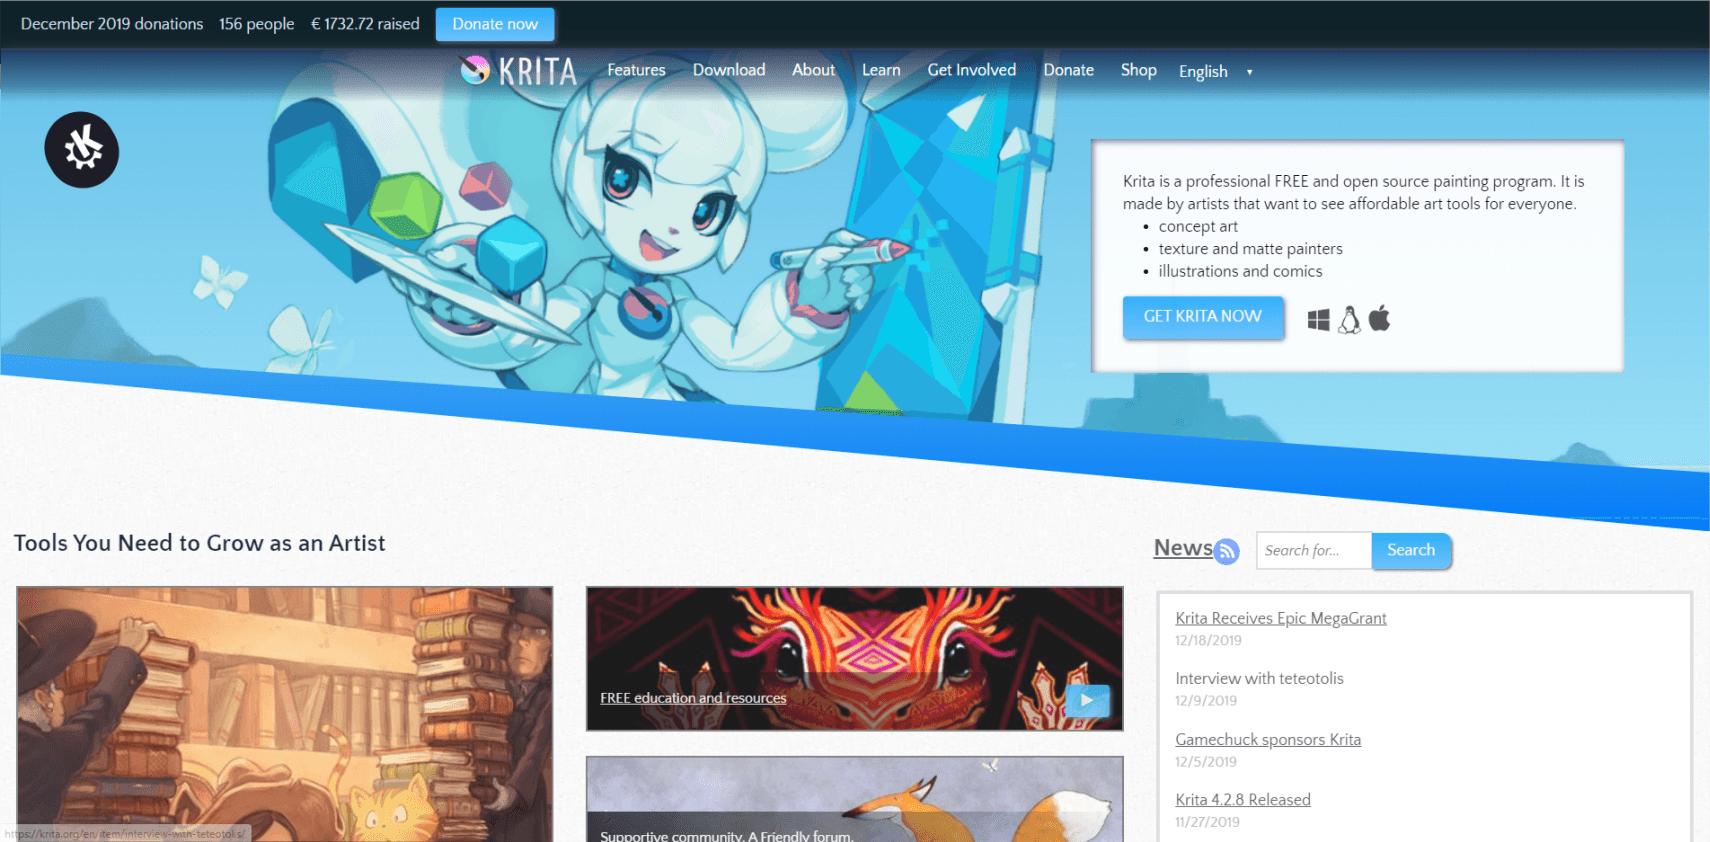 Krita Software Khusus Digital Painting Gratis Saingan